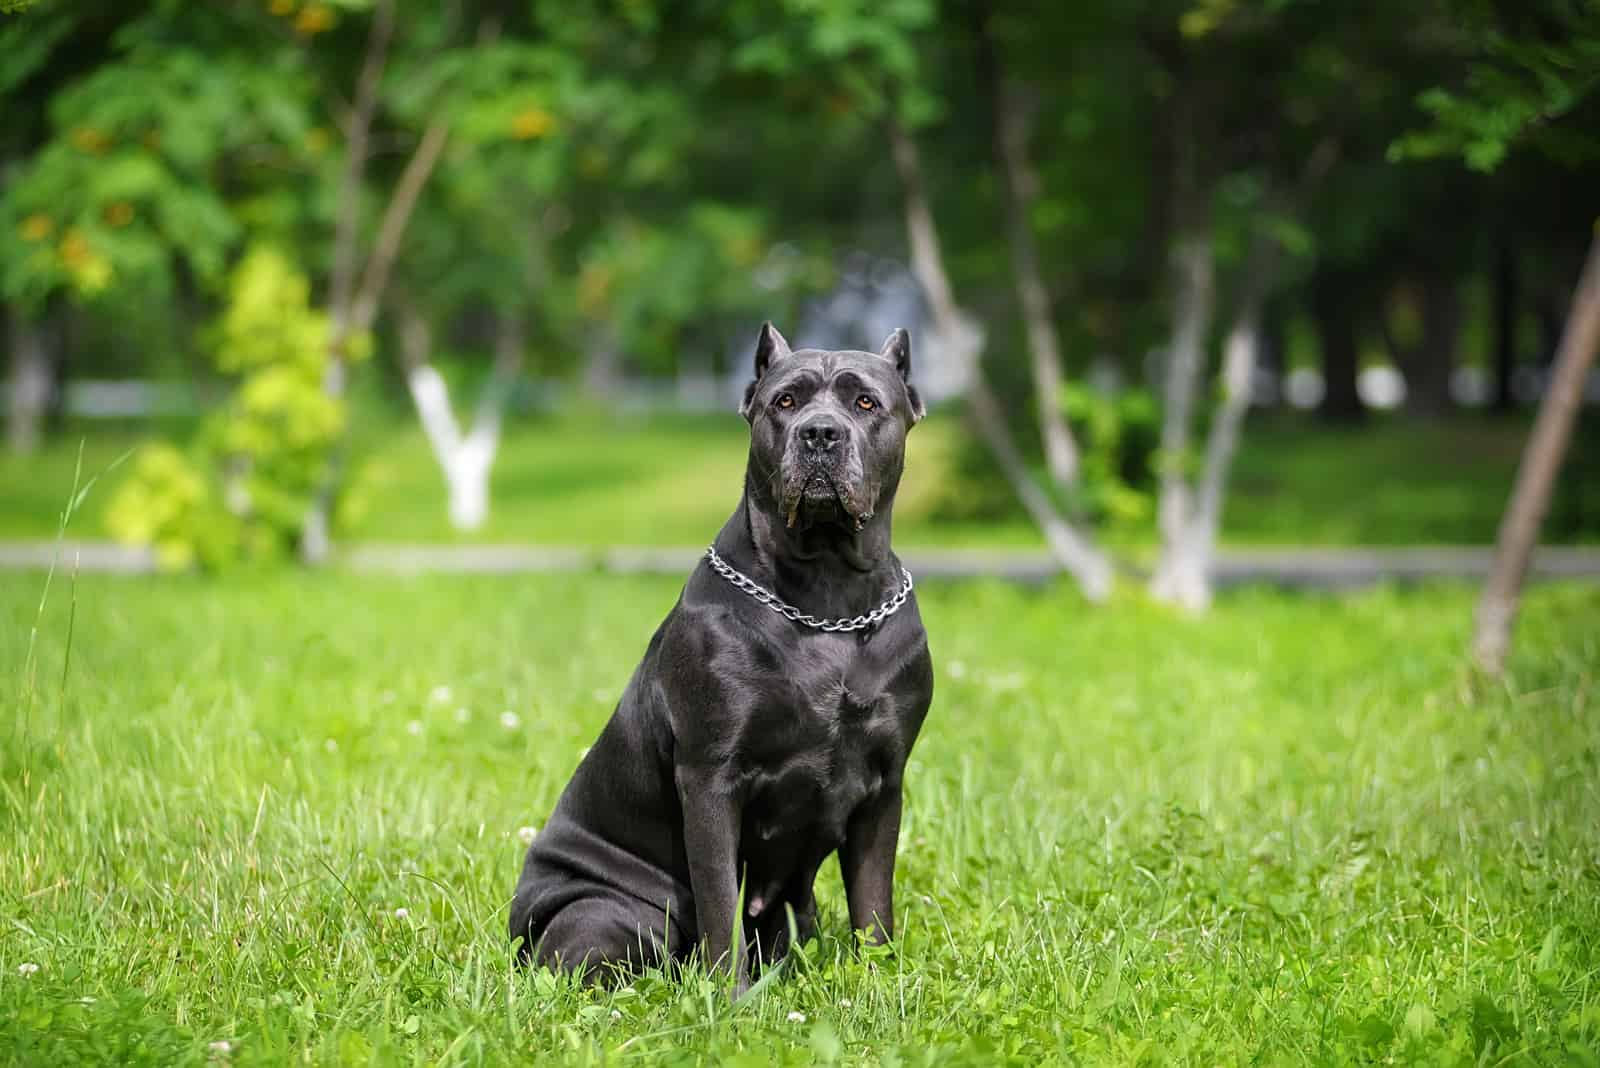 Cane Corso dog sitting on green grass alone